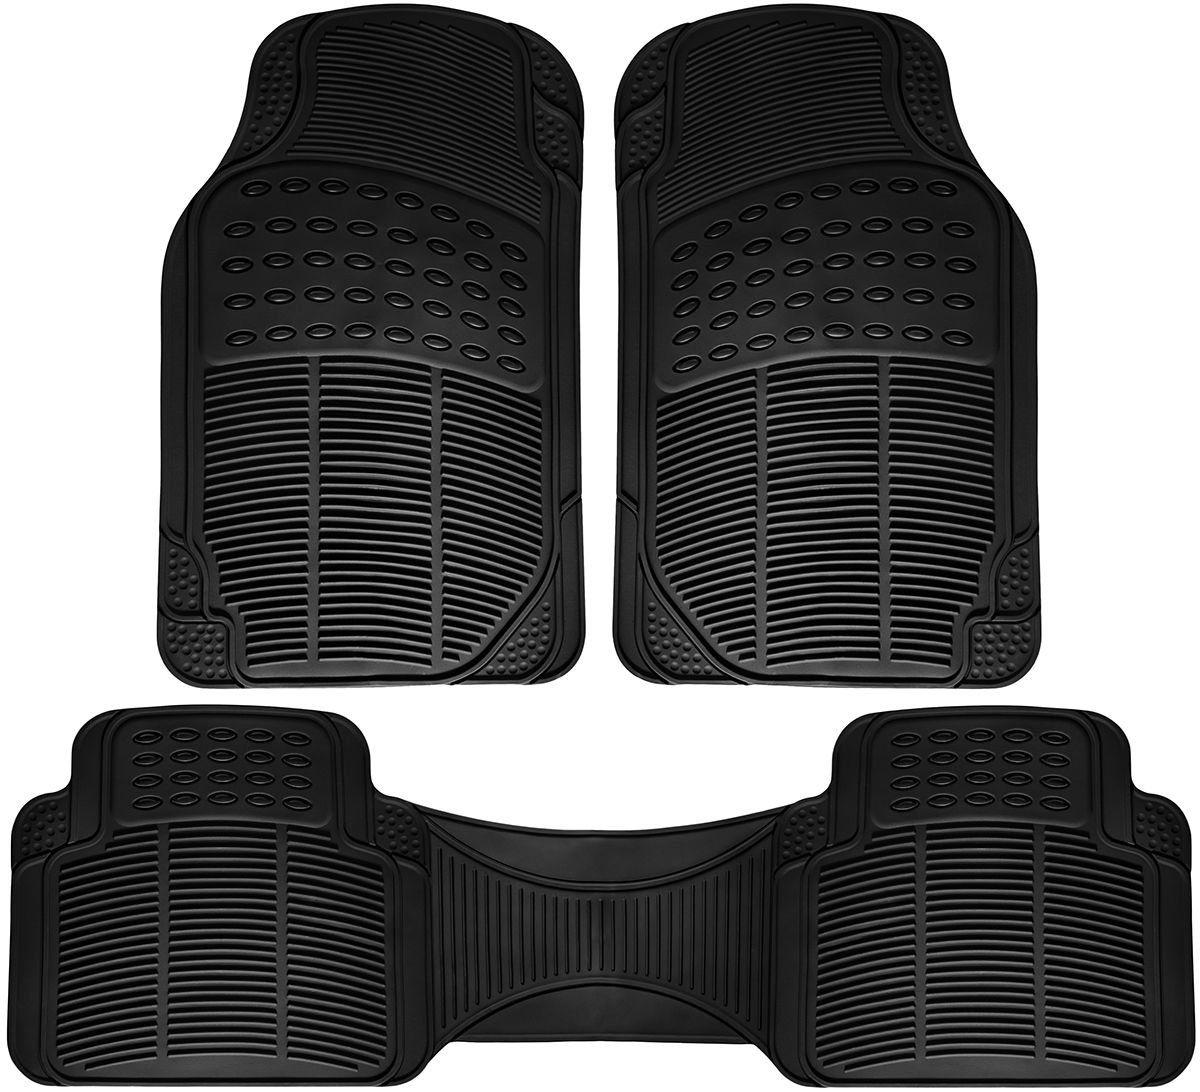 Floor mats kia soul - 3pc Set Car Floor Mats For Kia Soul All Weather Rubber Semi Custom Fit Black